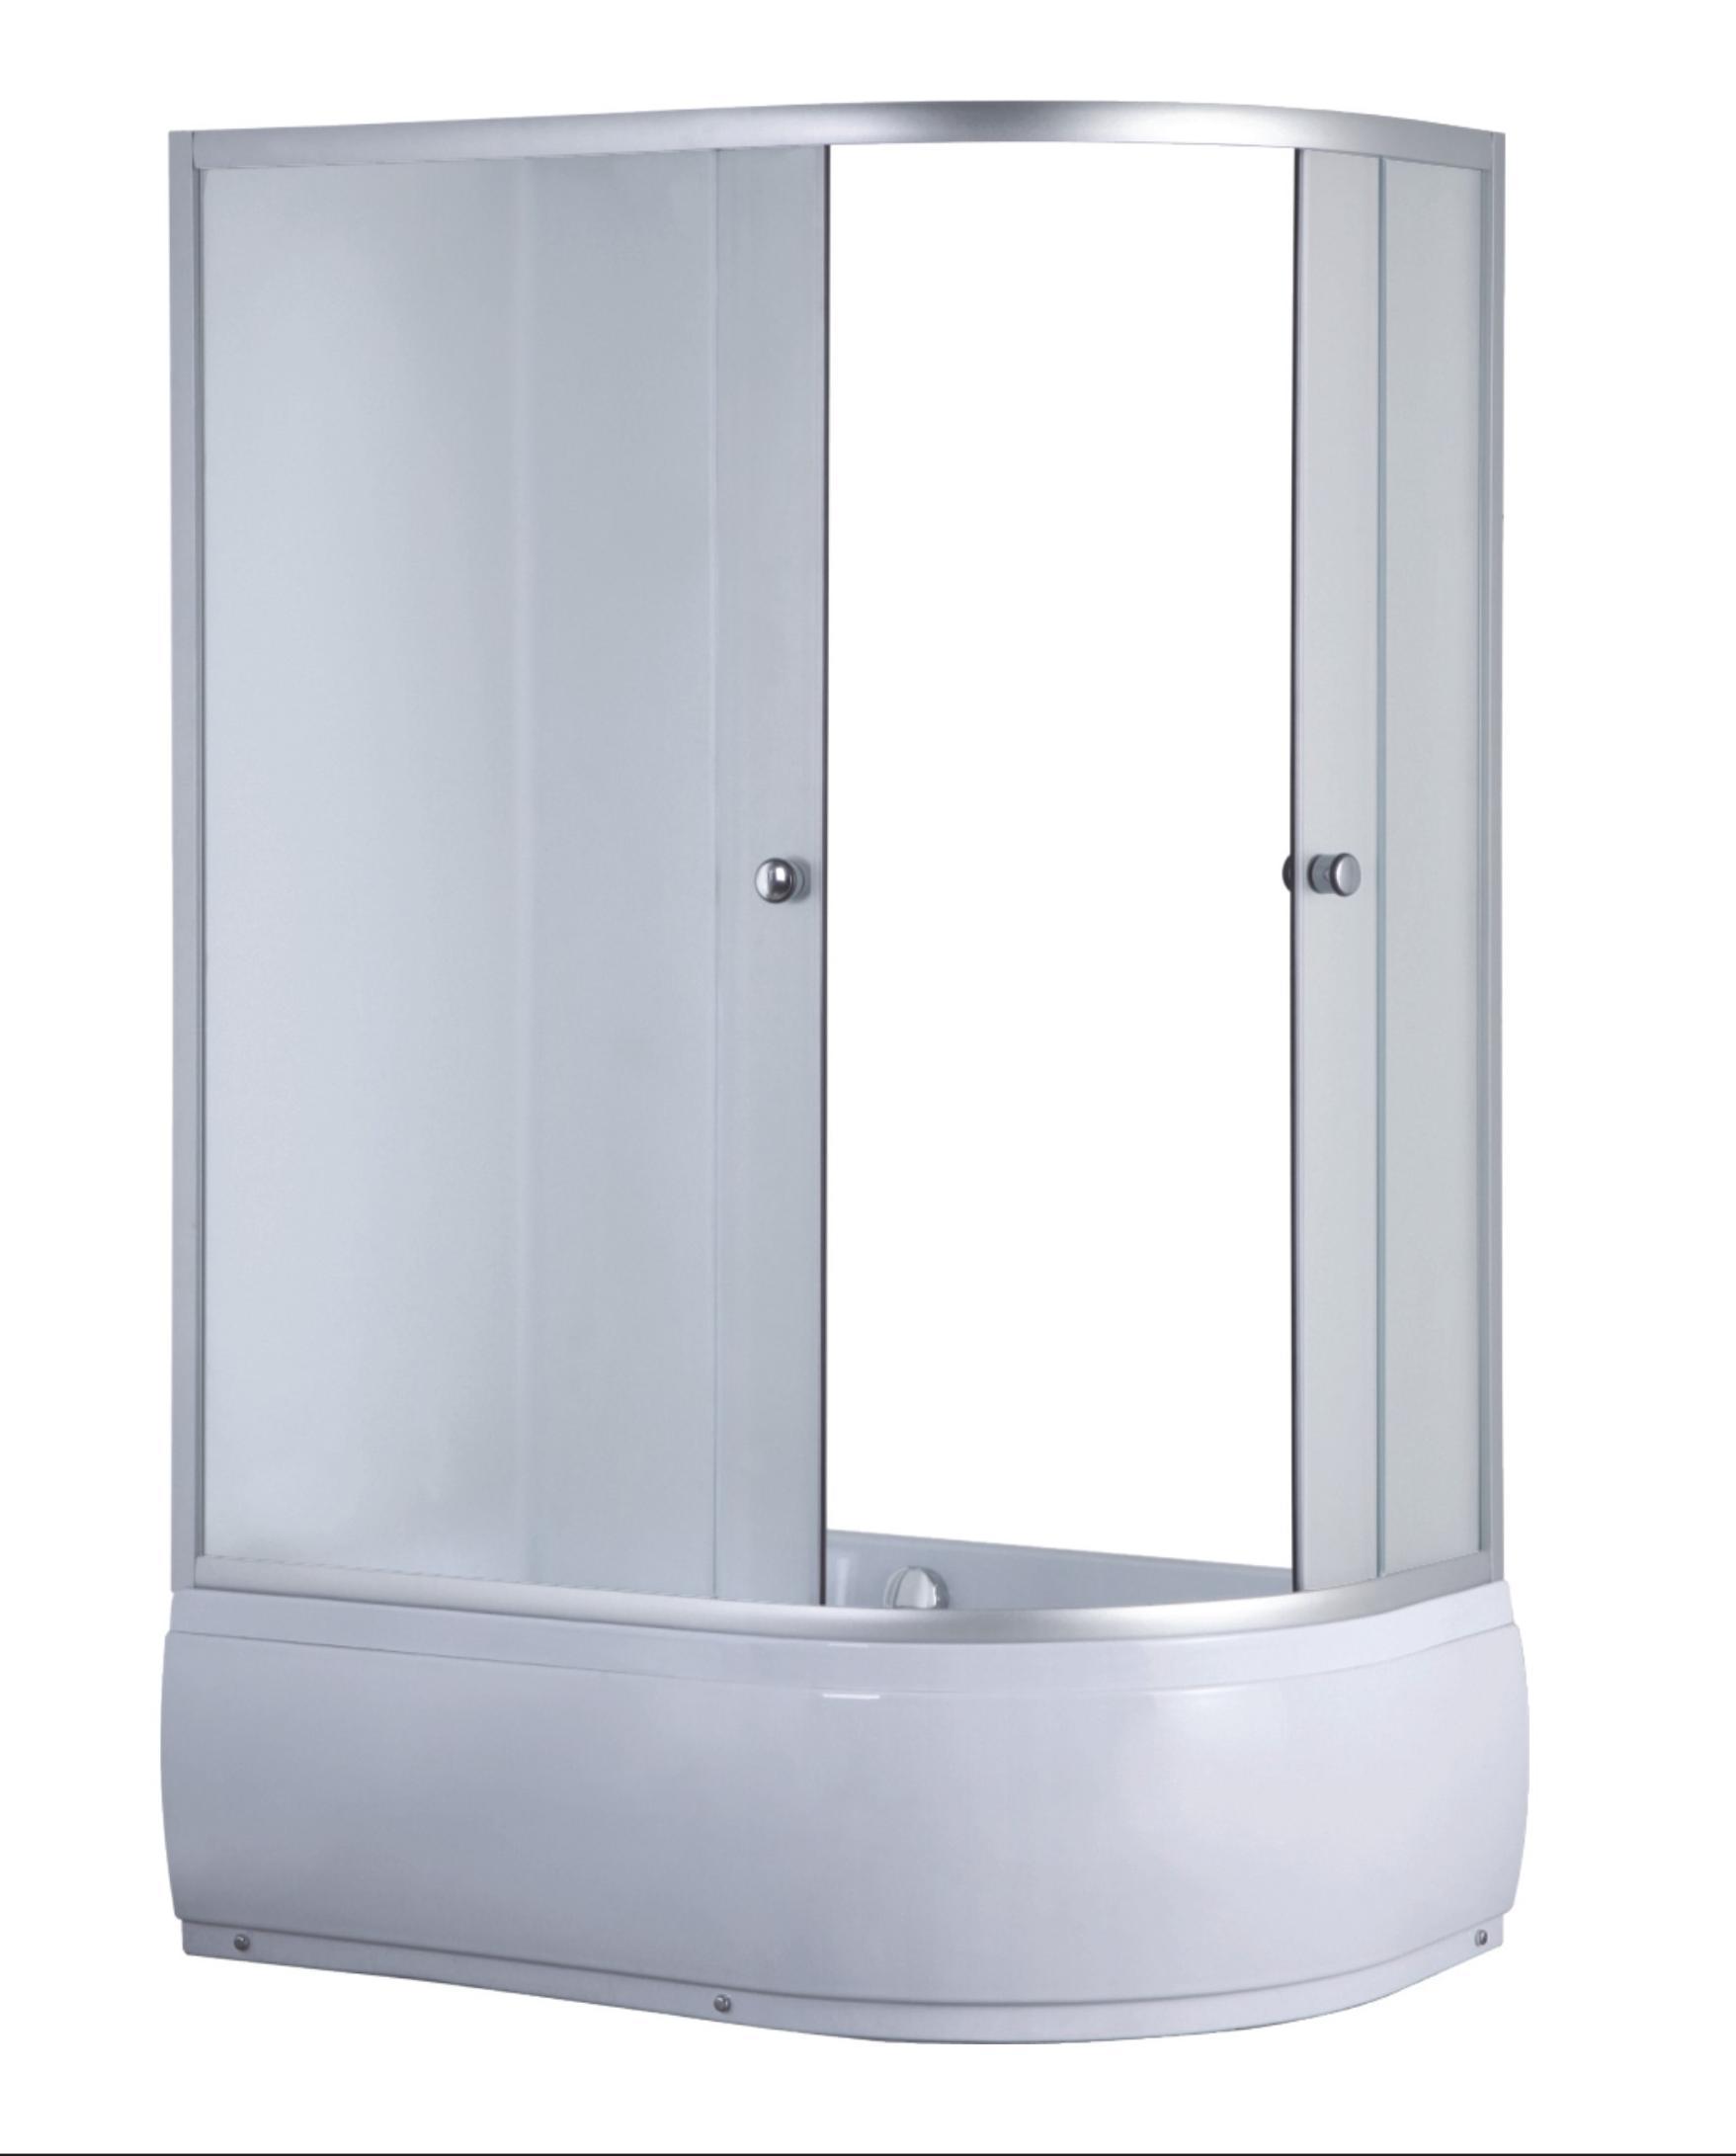 DURHAM 120 L Well sprchový kout s vysokou vaničkou, skladem, doprava zdarma